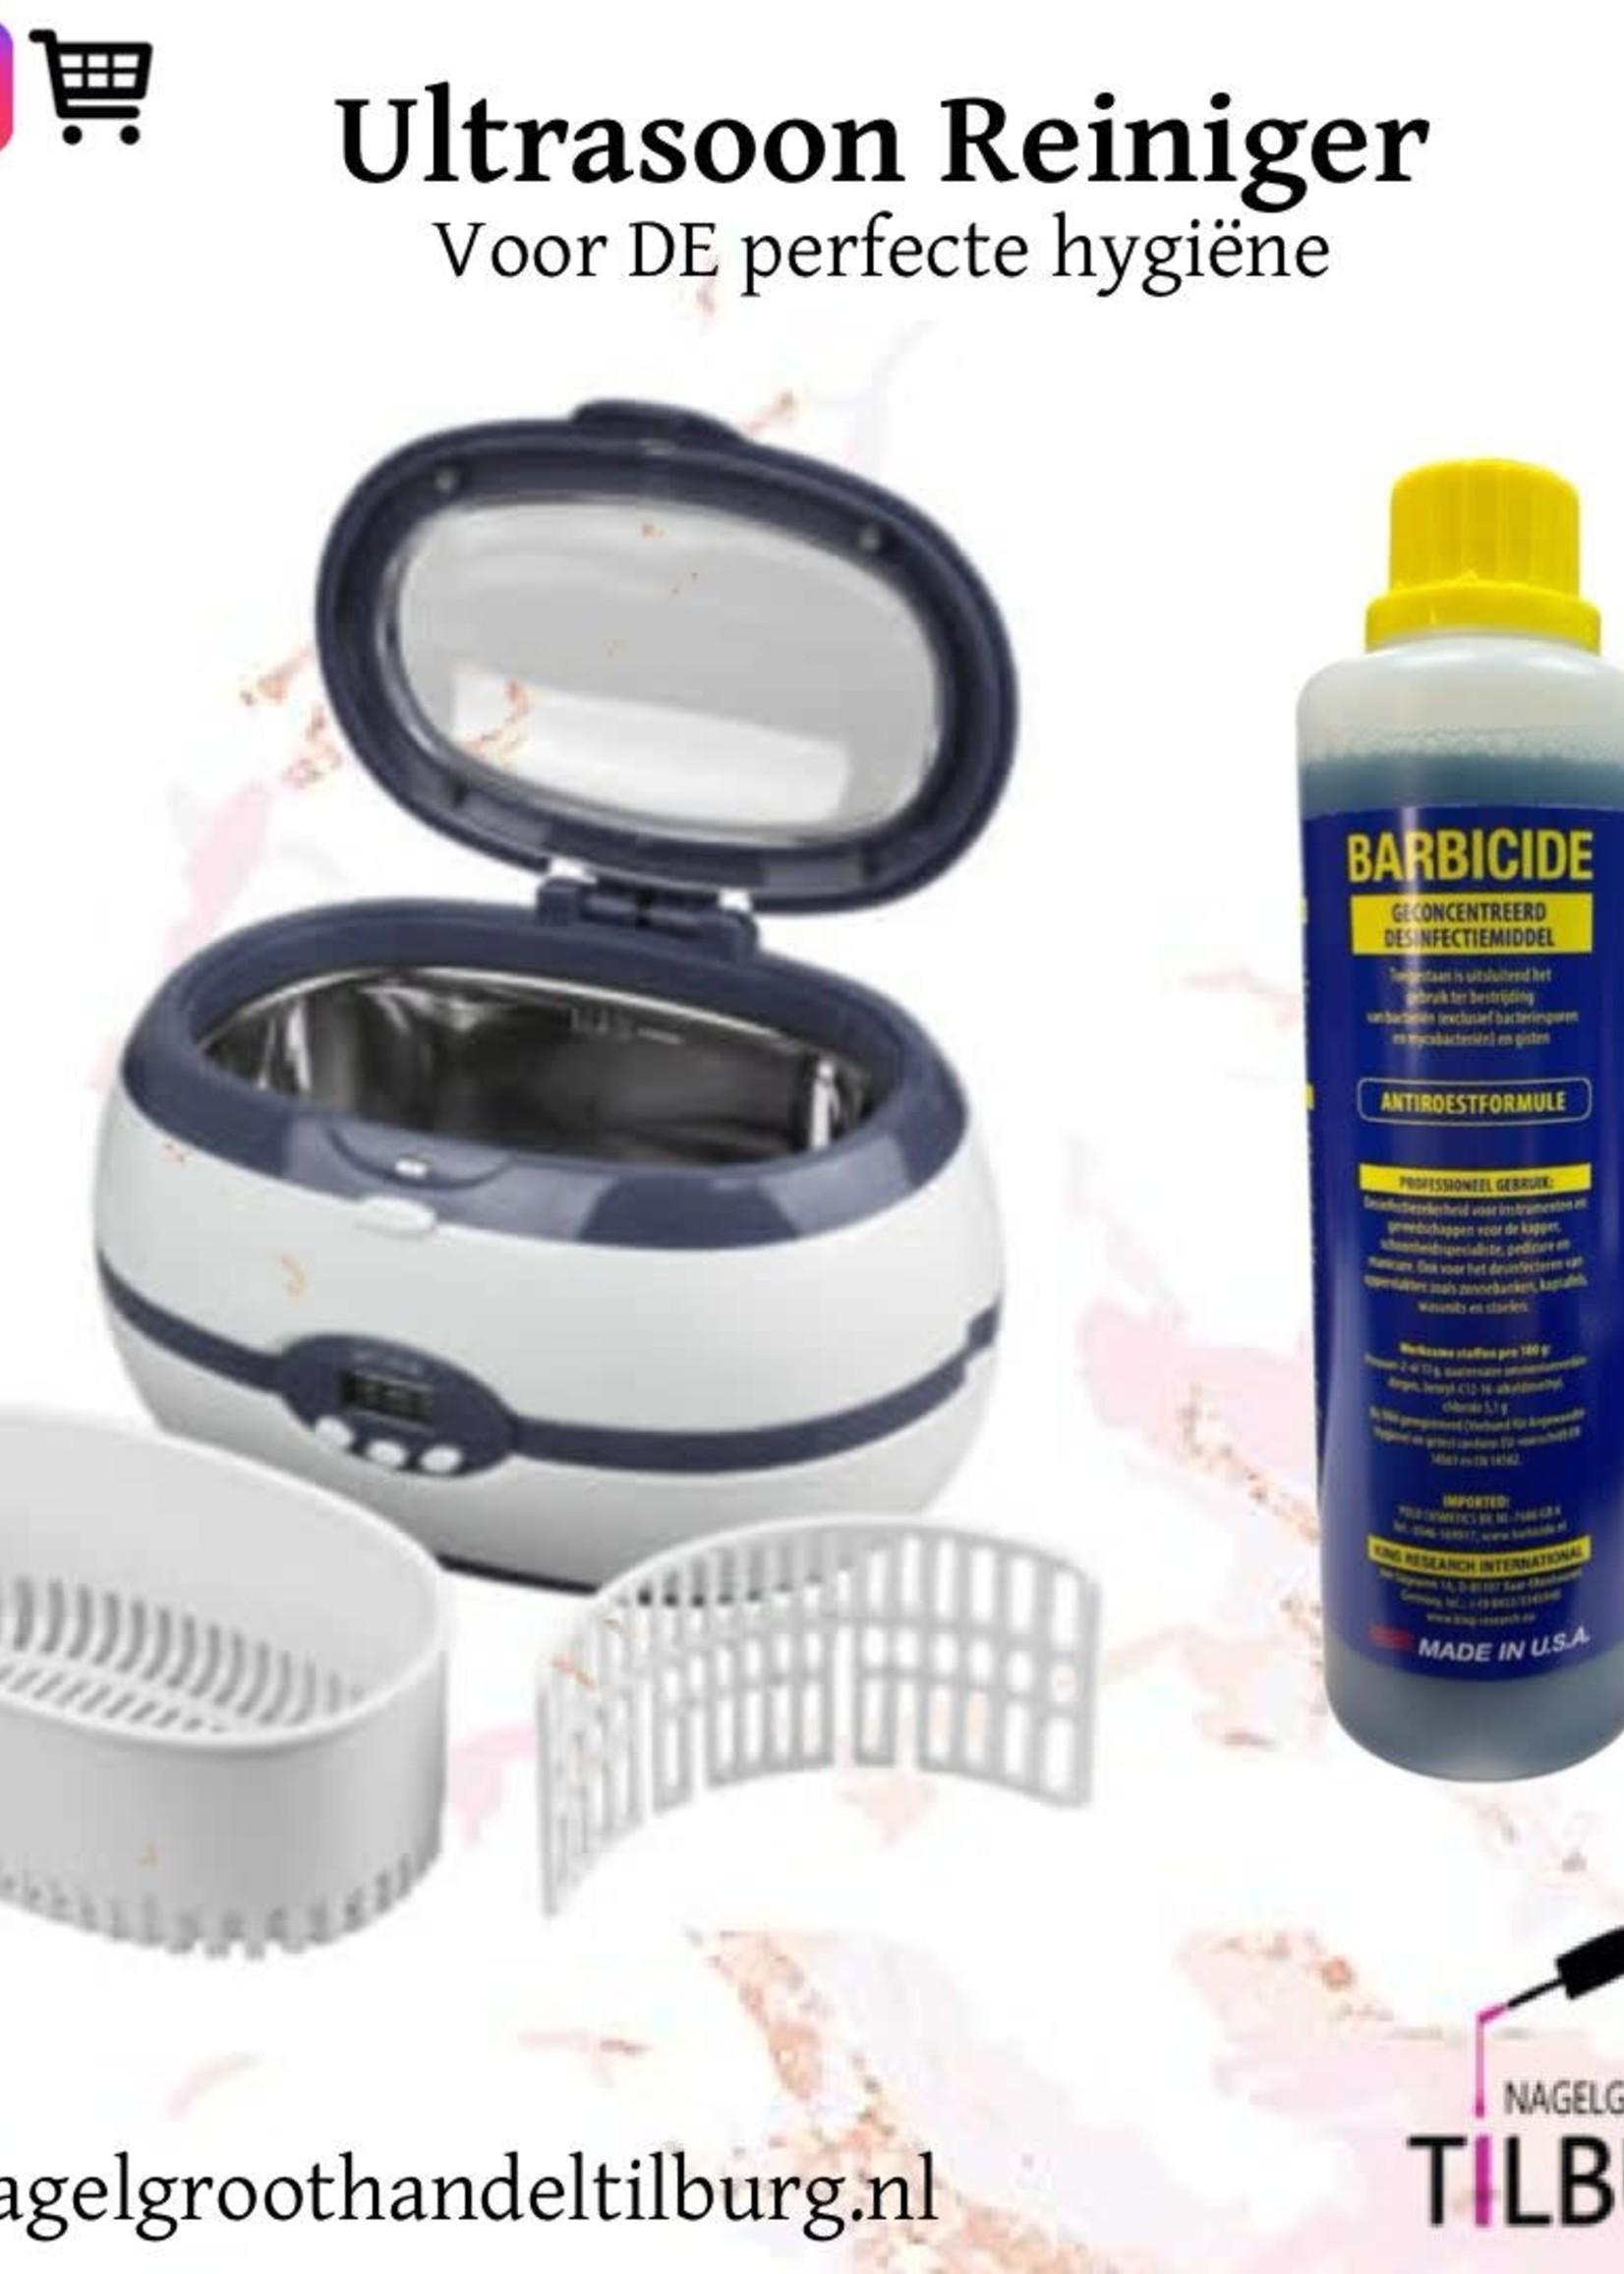 Ultrasonic Cleaner + Barbicide 480ml